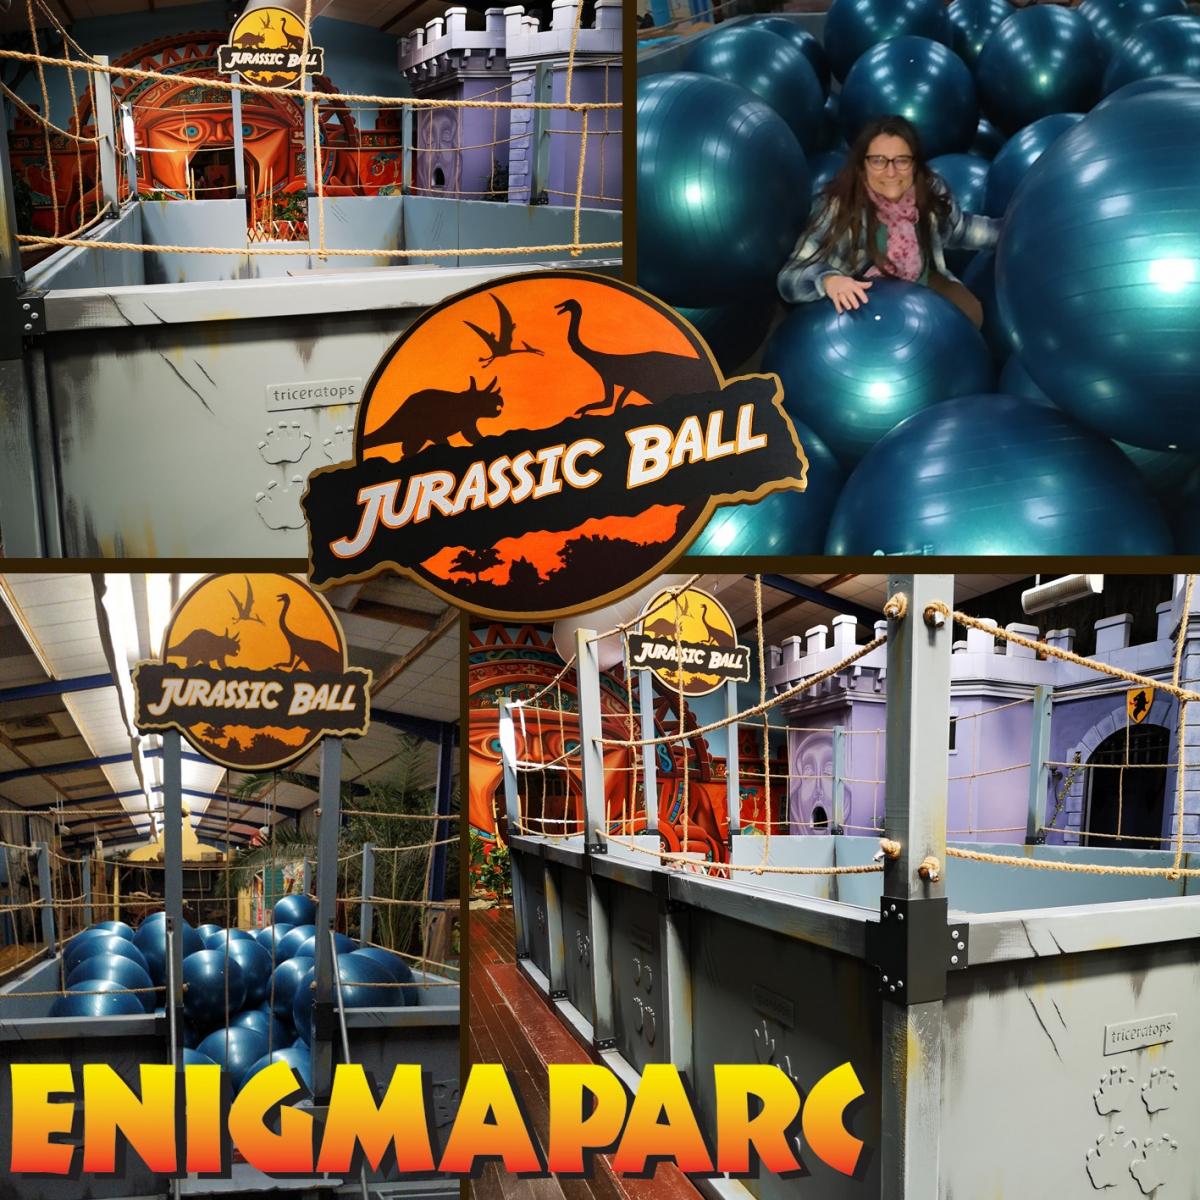 Nouveau 2020 : Jurrassic Ball